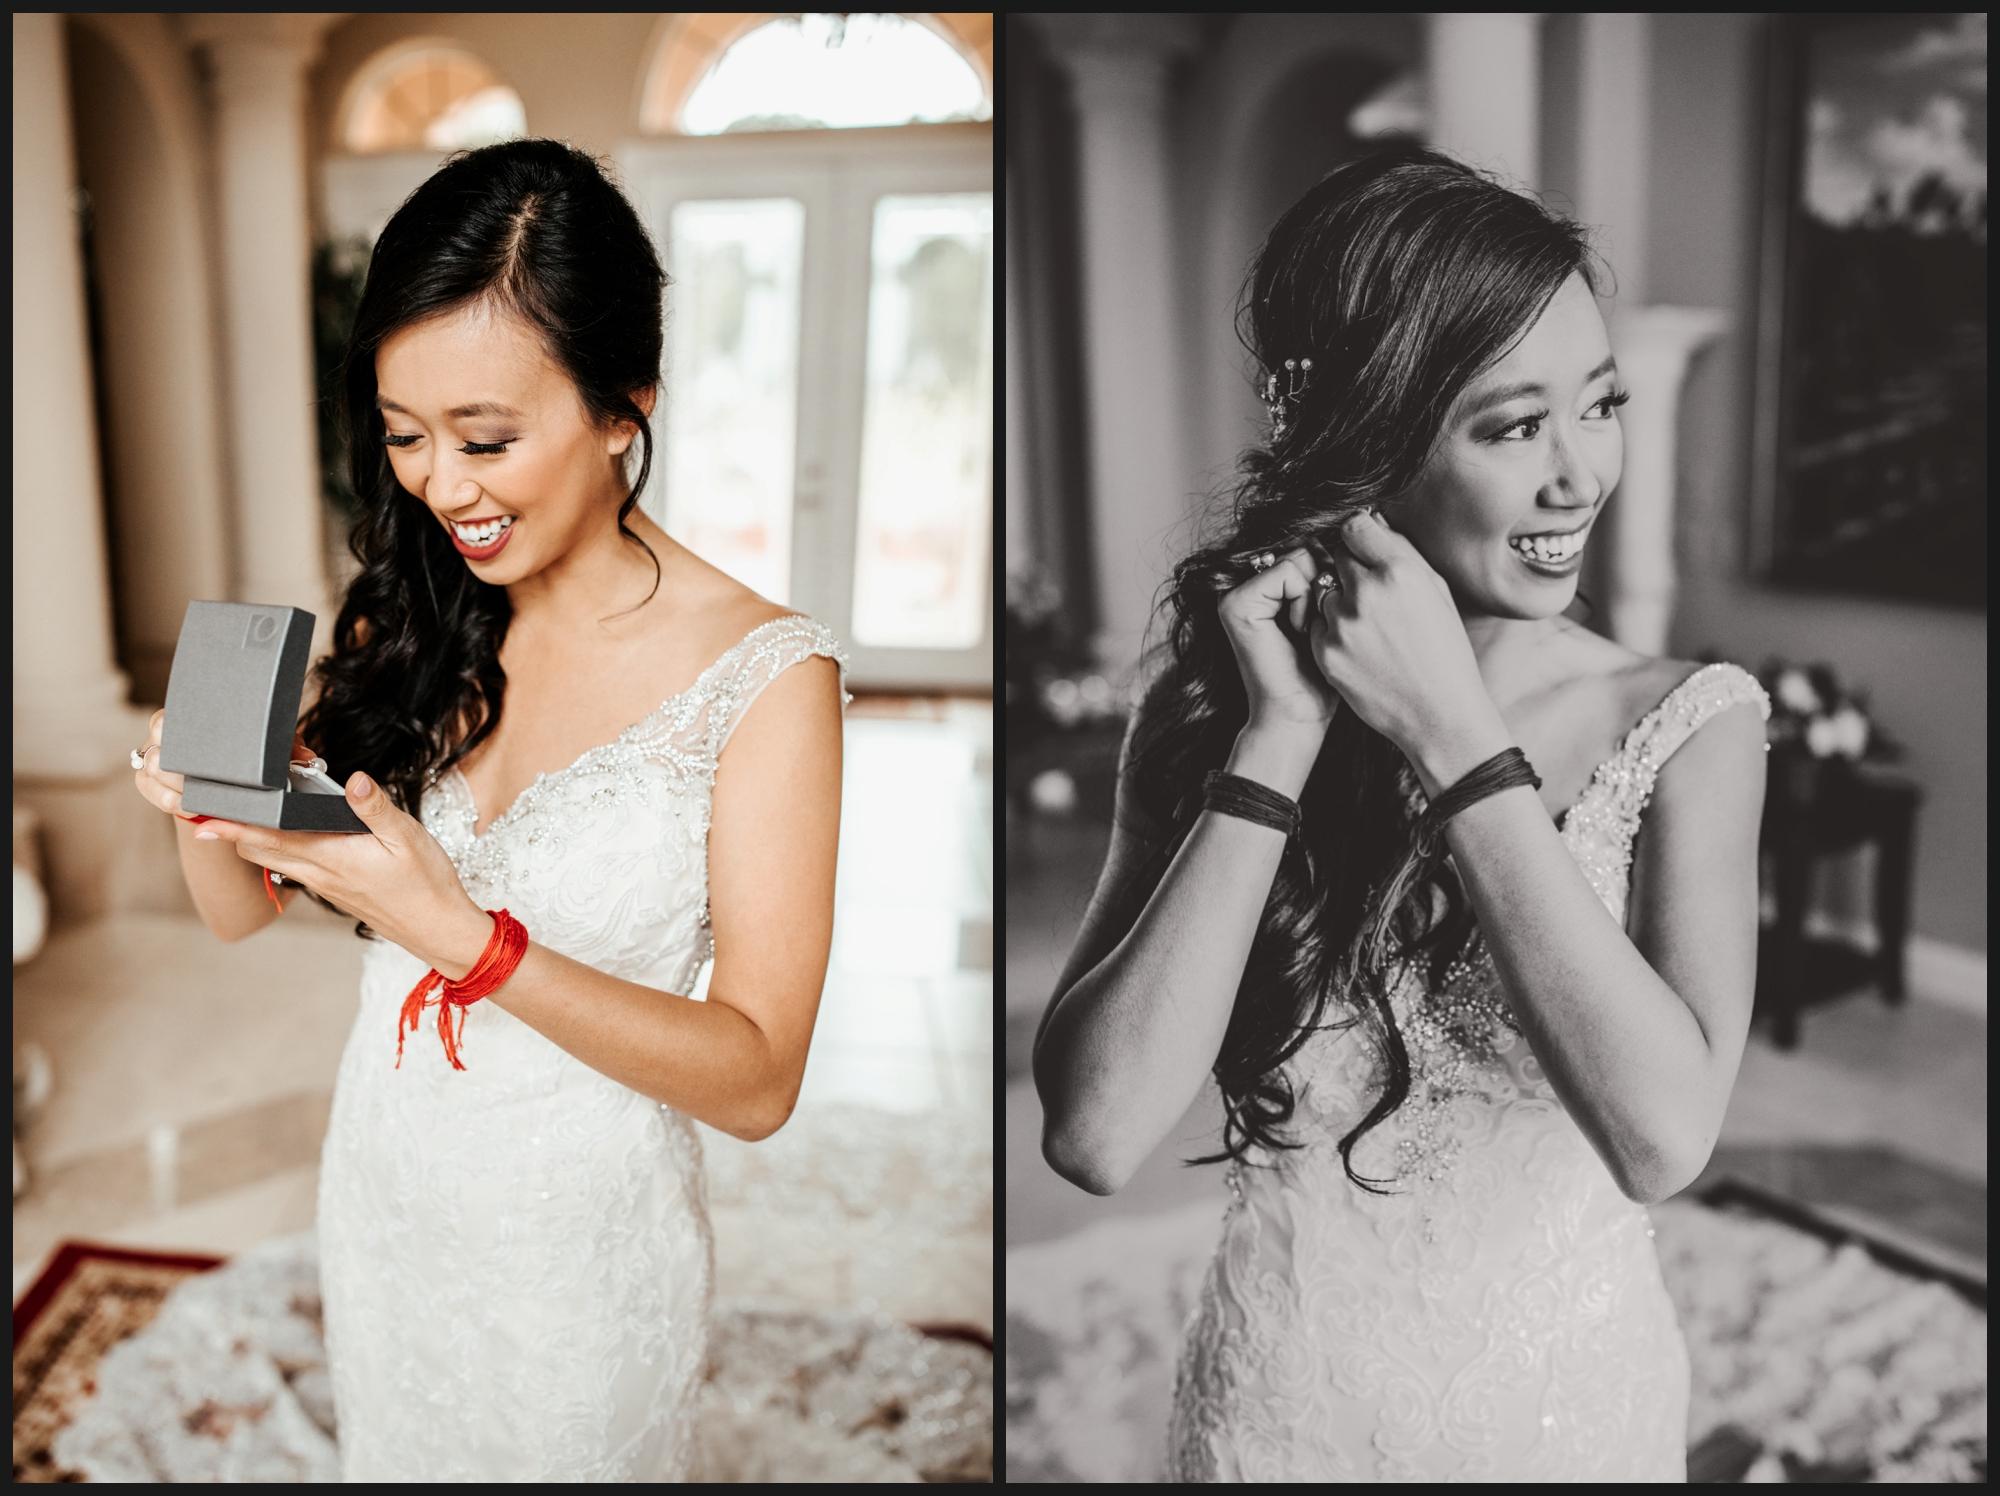 Orlando-Wedding-Photographer-destination-wedding-photographer-florida-wedding-photographer-bohemian-wedding-photographer_1354.jpg